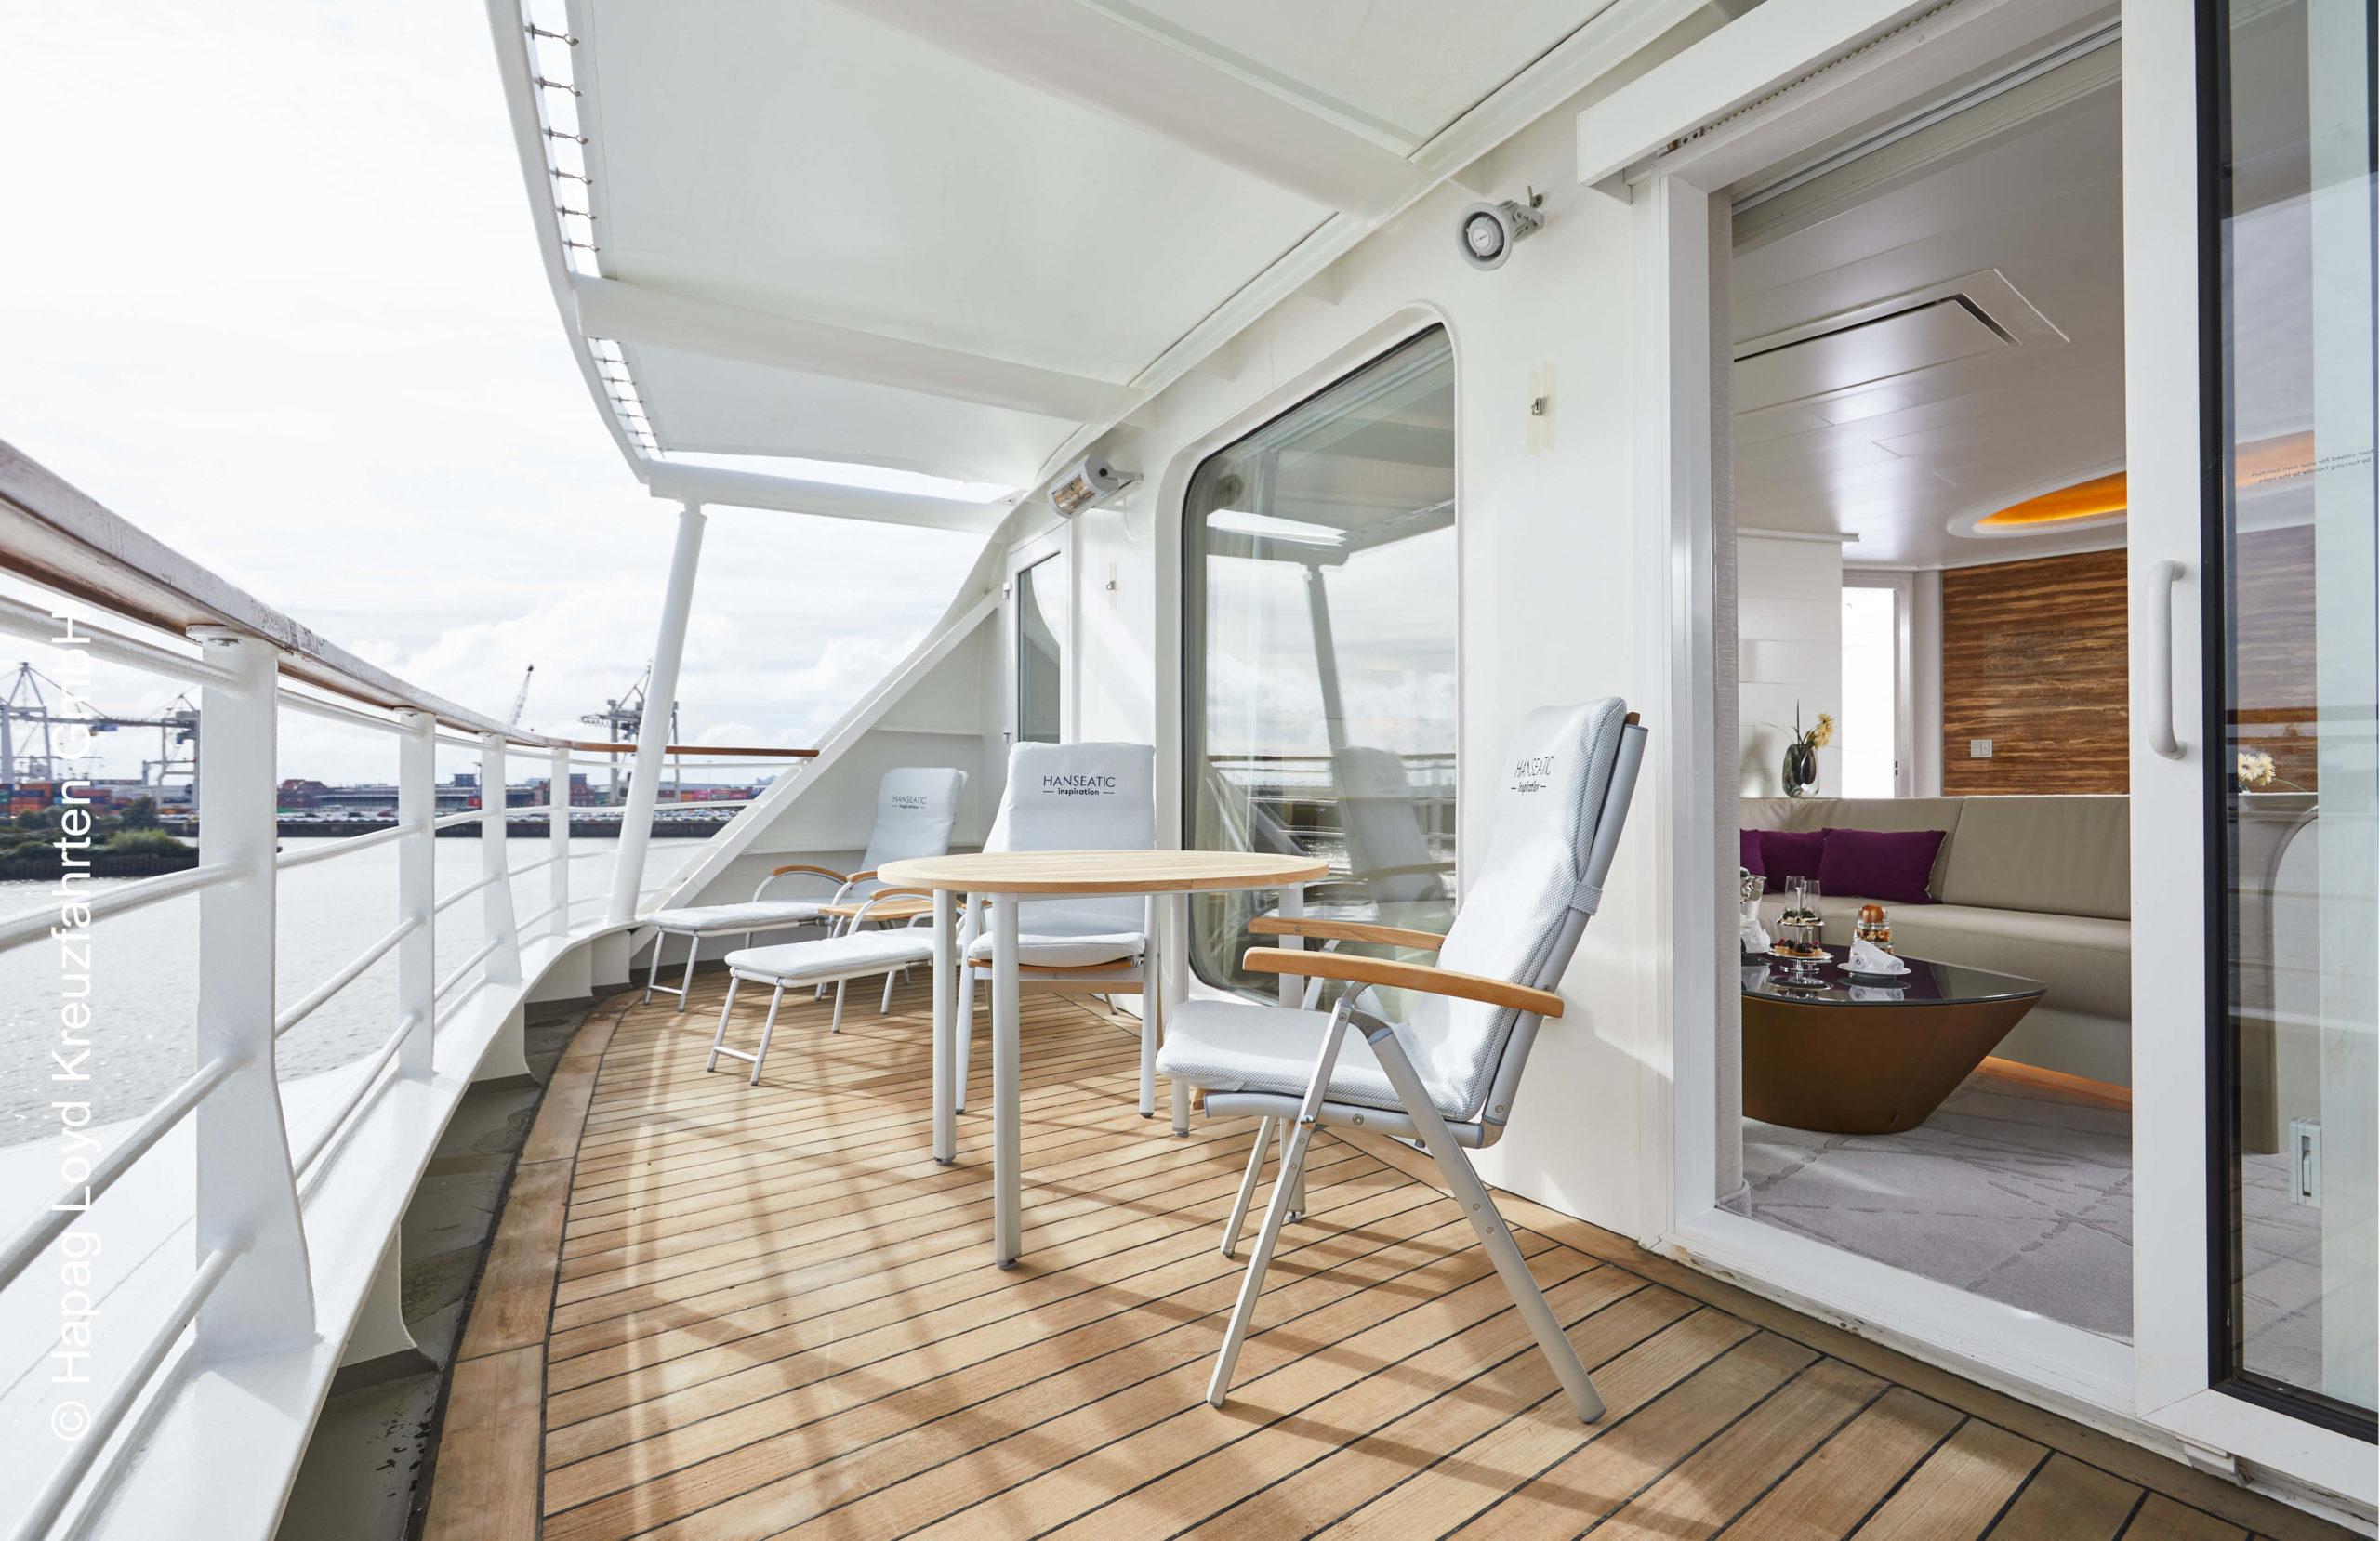 Hapag Lloyd Hanseatic inspiration Grand Suite Balkon